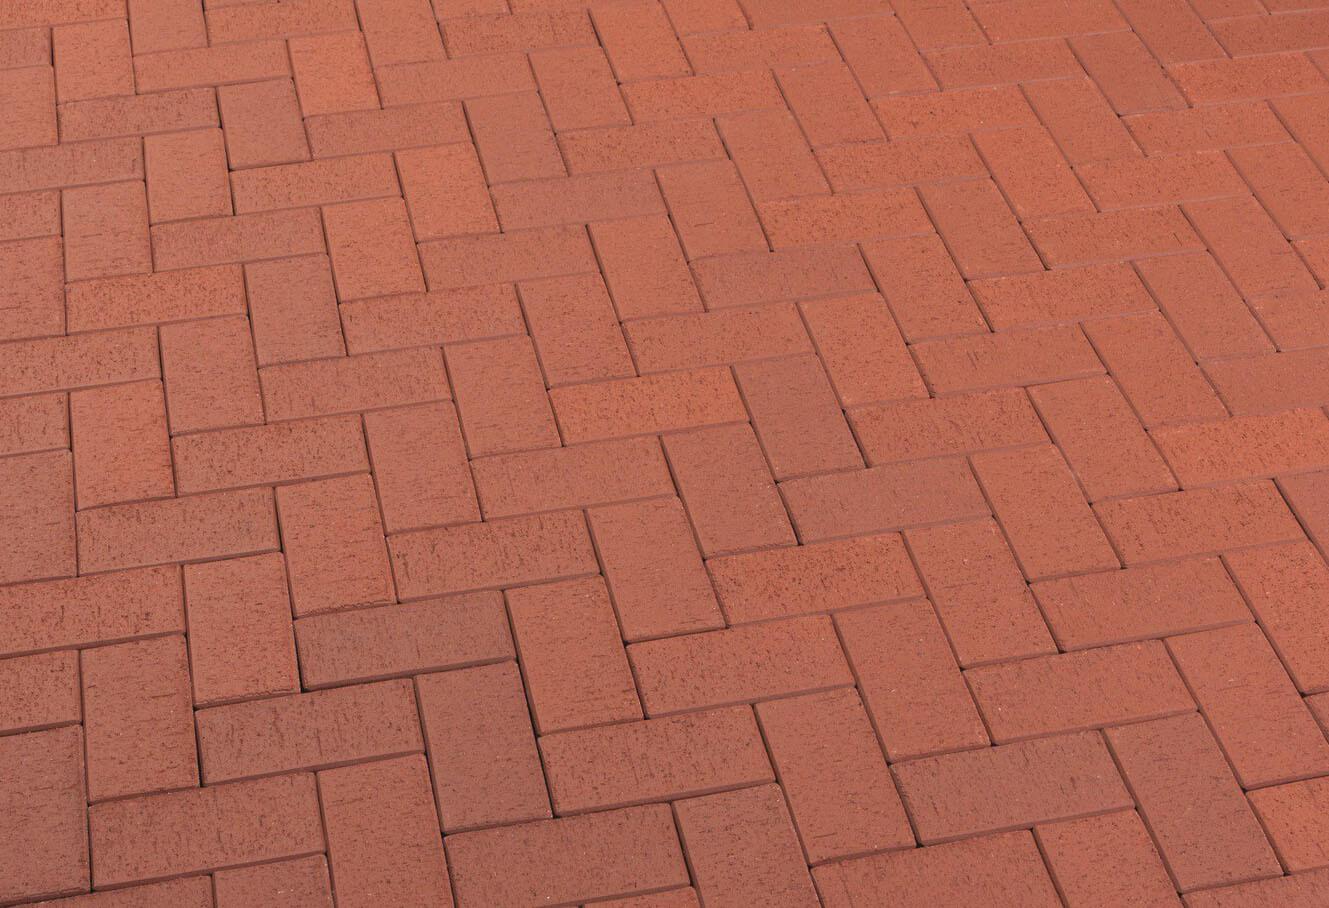 Feldhaus Klinker - P402SKF, Gala plano, красный с оттенками, 200x100x40 - Клинкерная тротуарная брусчатка